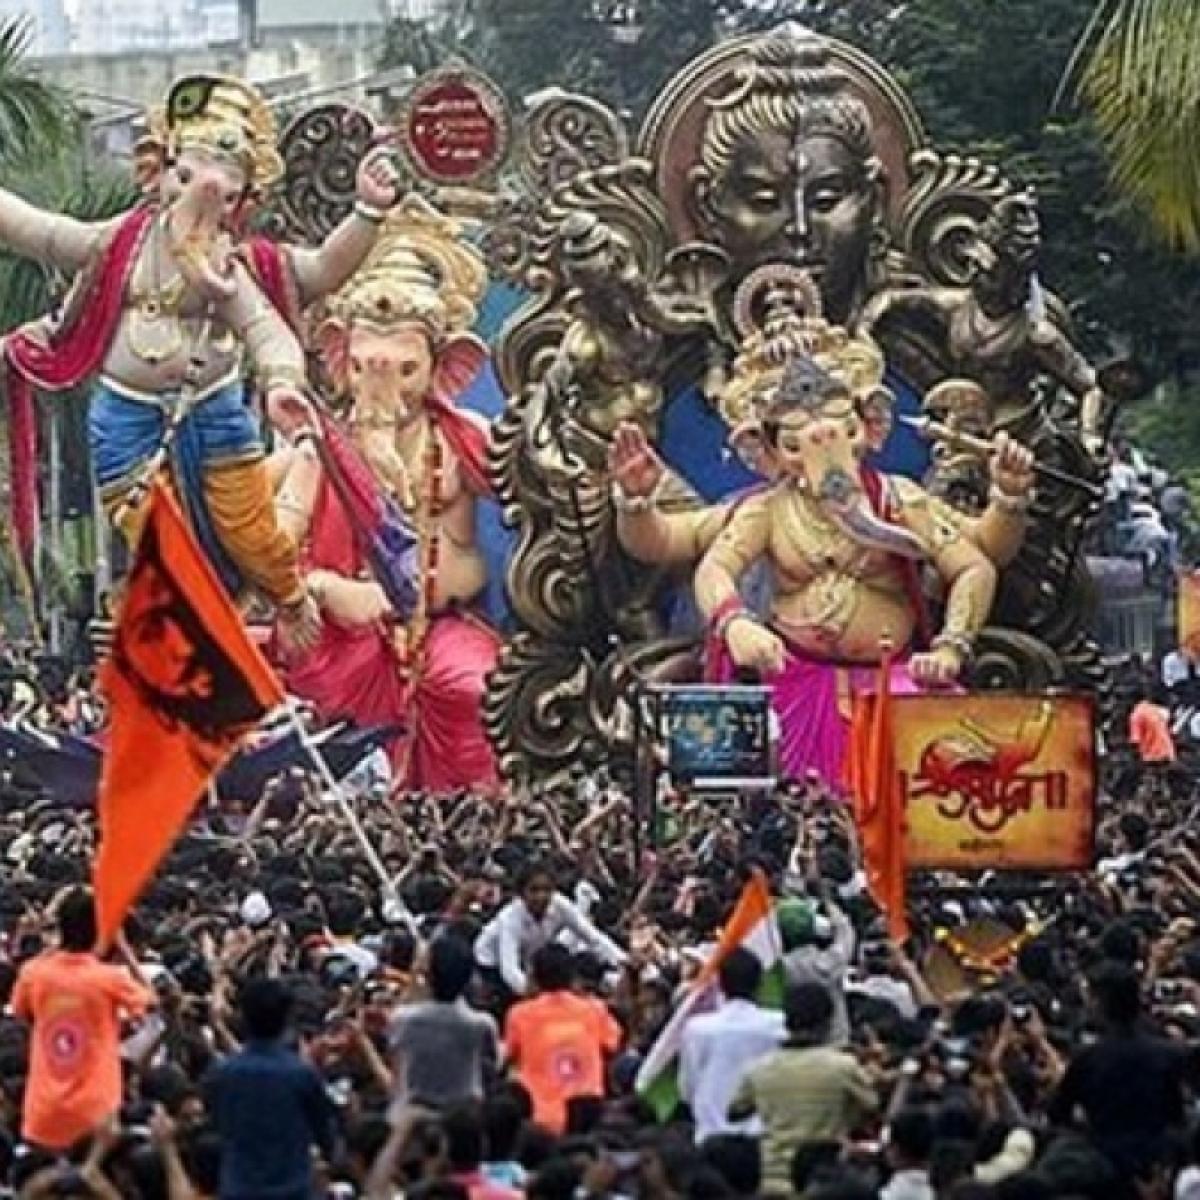 Ganesh Utsav 2020: Traffic jams at Konkan checkpost as state govt yet to issue guidelines